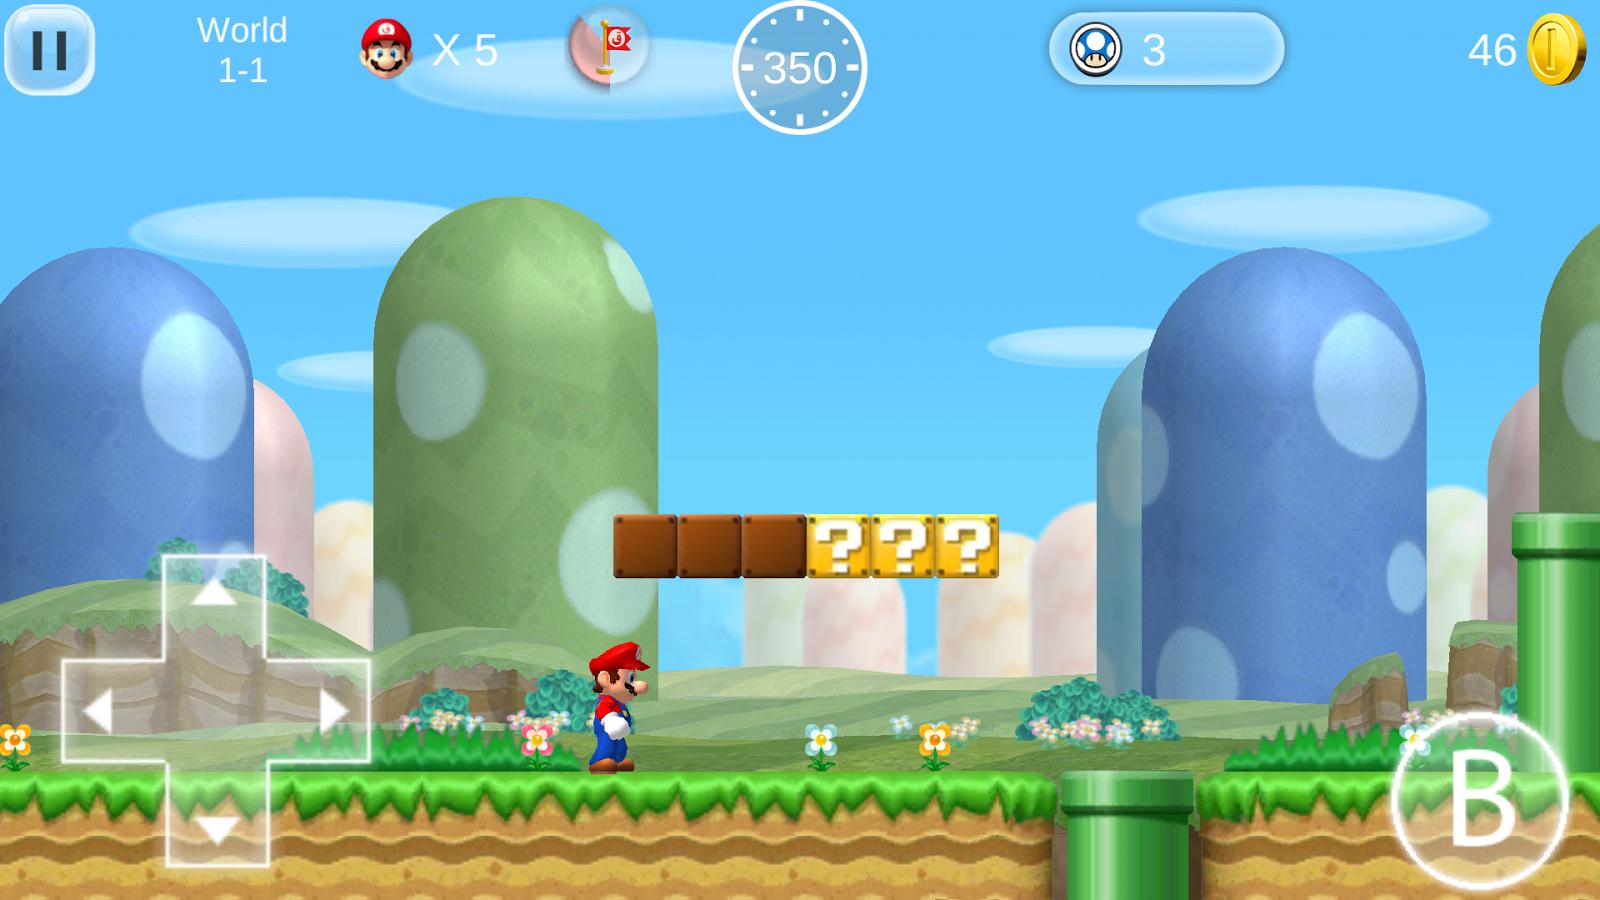 Como ter dinheiro infinito no Super Mario 2 HD